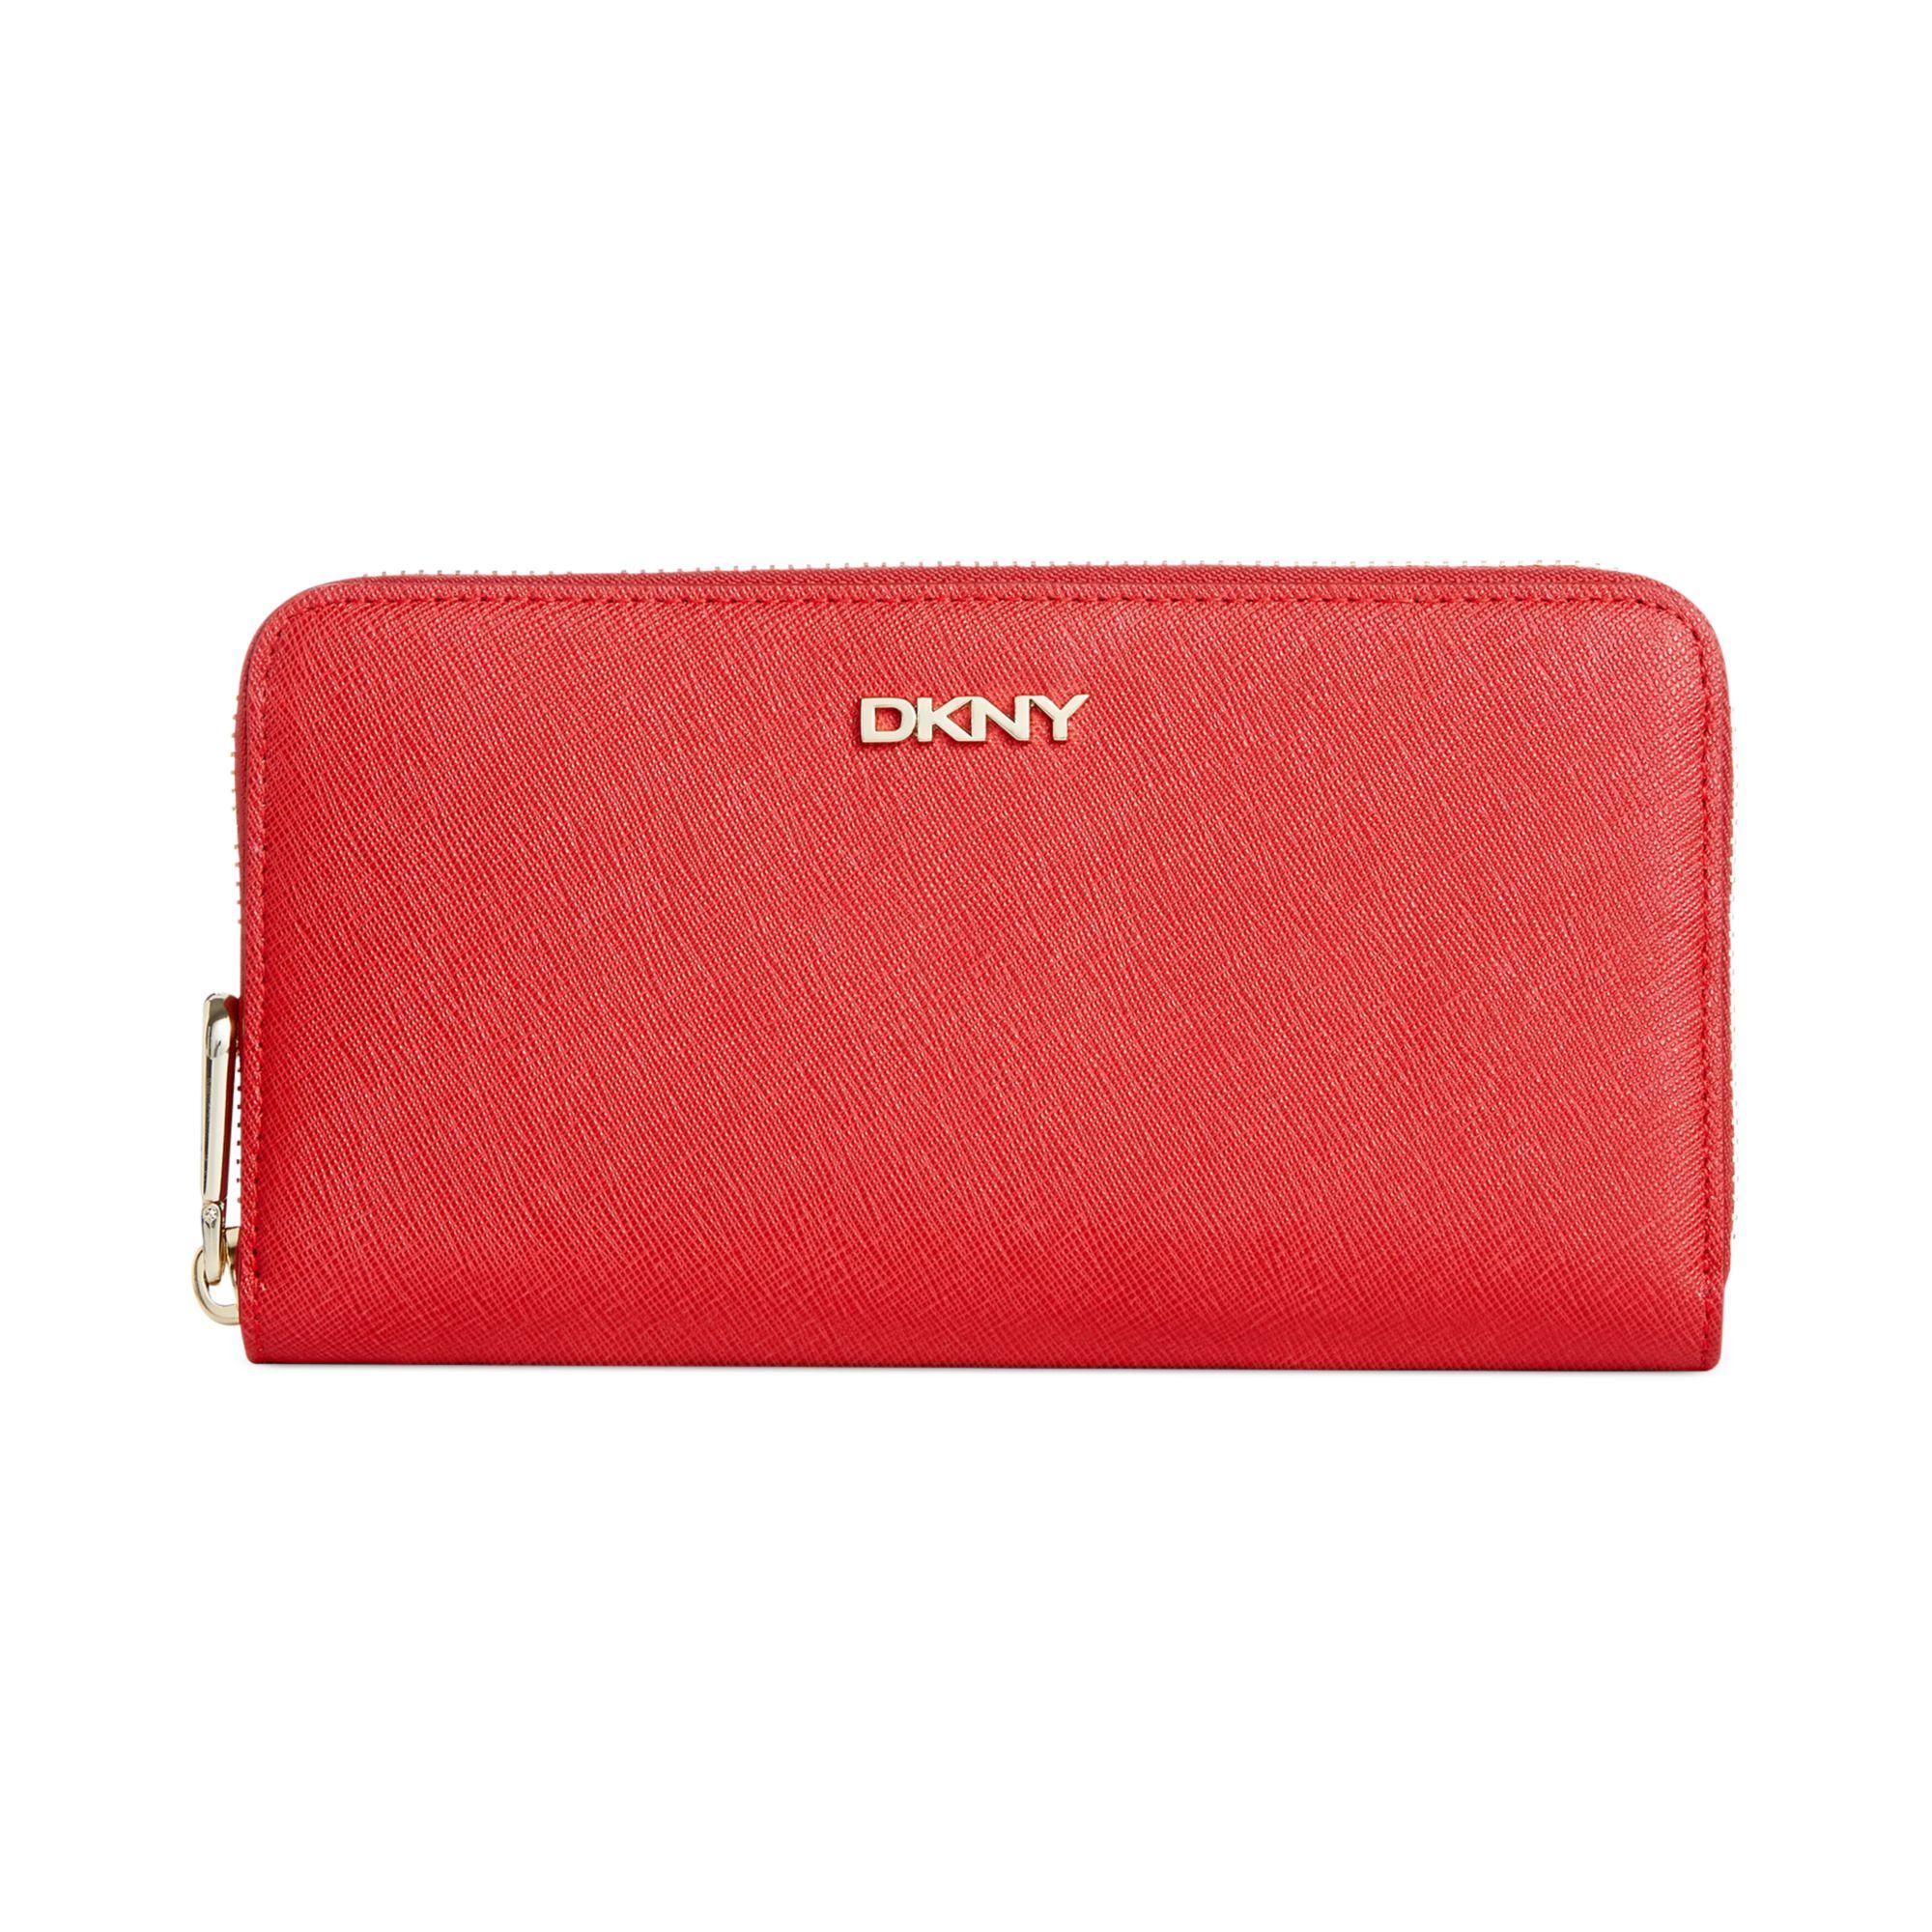 Dkny Saffiano Large Zip Wallet in Red | Lyst |Dkny Wallet